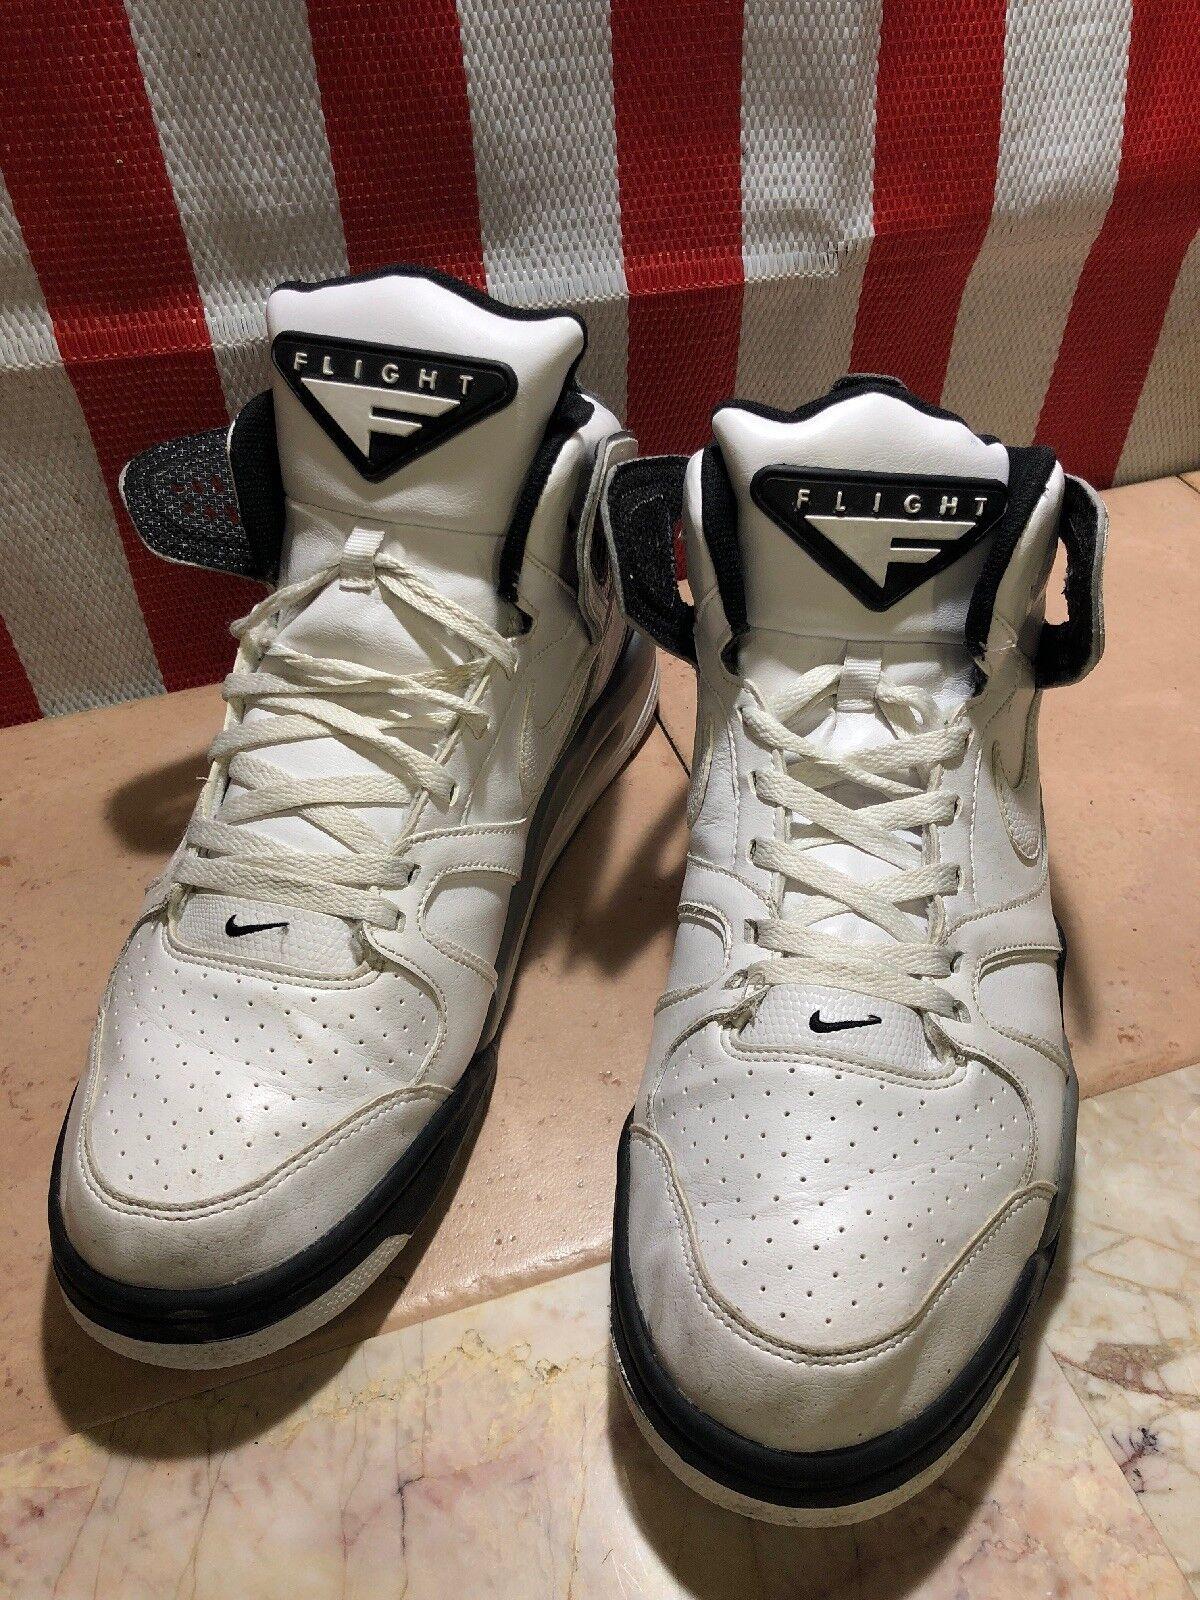 NIKE Air Flight Falcon 397204-102 Basketball Shoes LEATHER MENS SZ 14 US